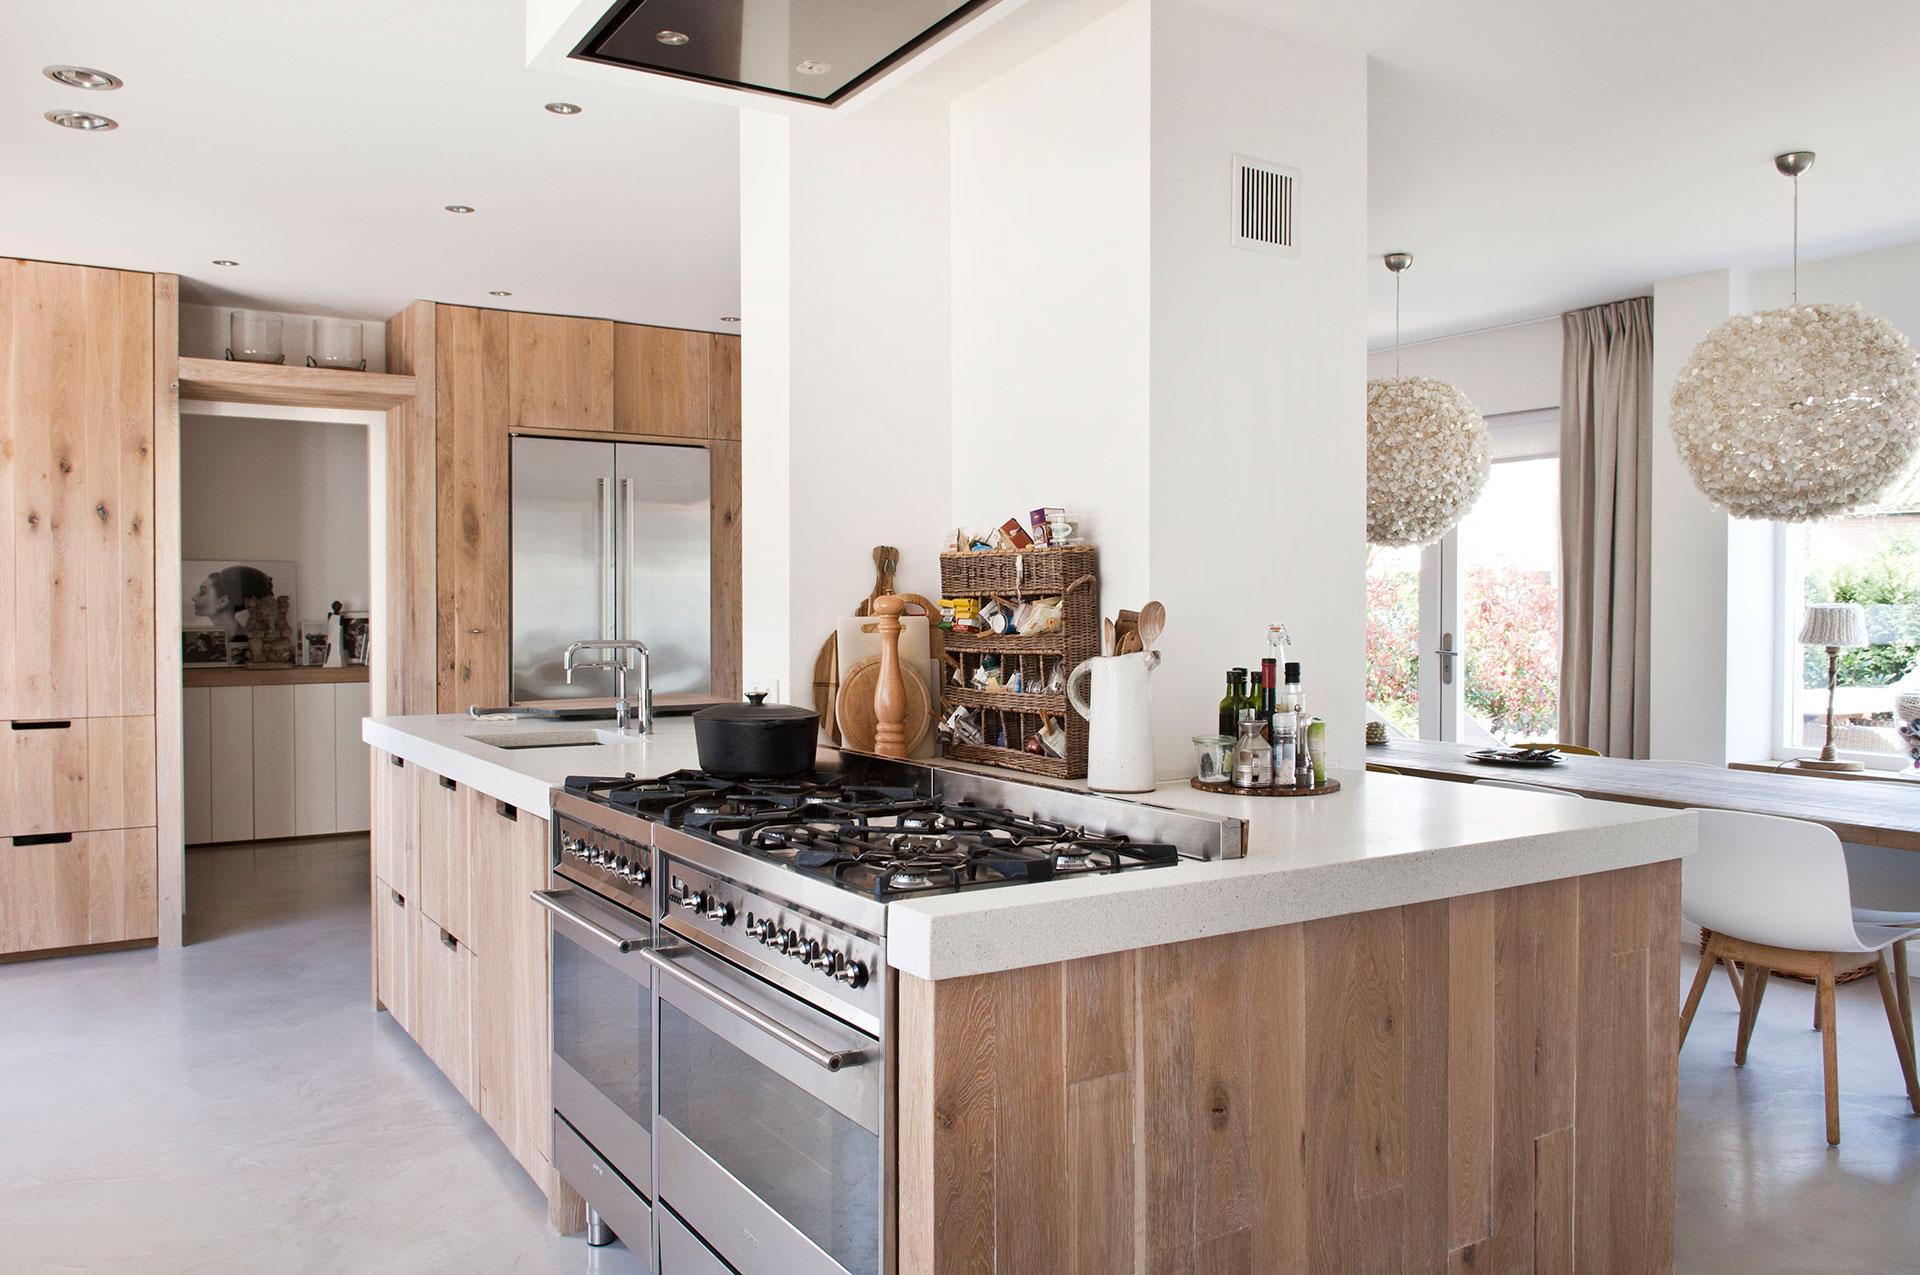 Kookeiland Keuken Houten : Kookeiland keuken houten cool vithelp keuken lamp tl eigen huis